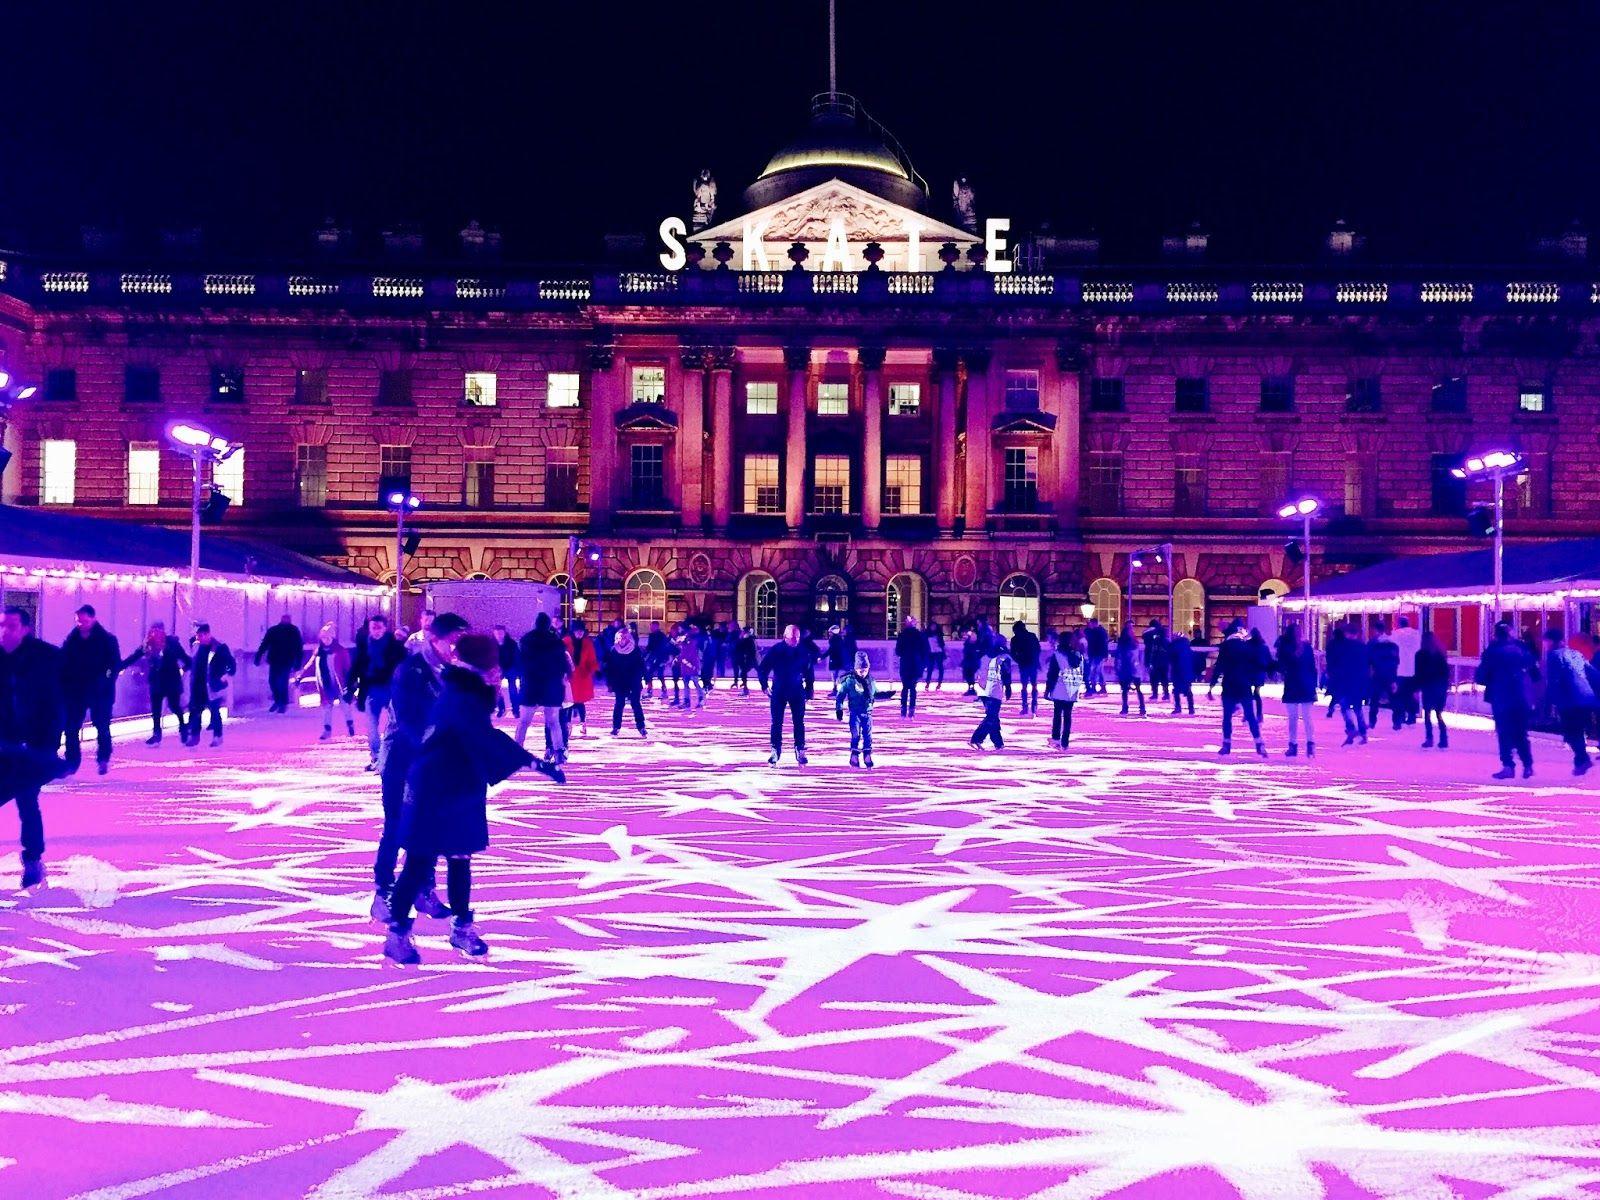 Skate at Somerset House London